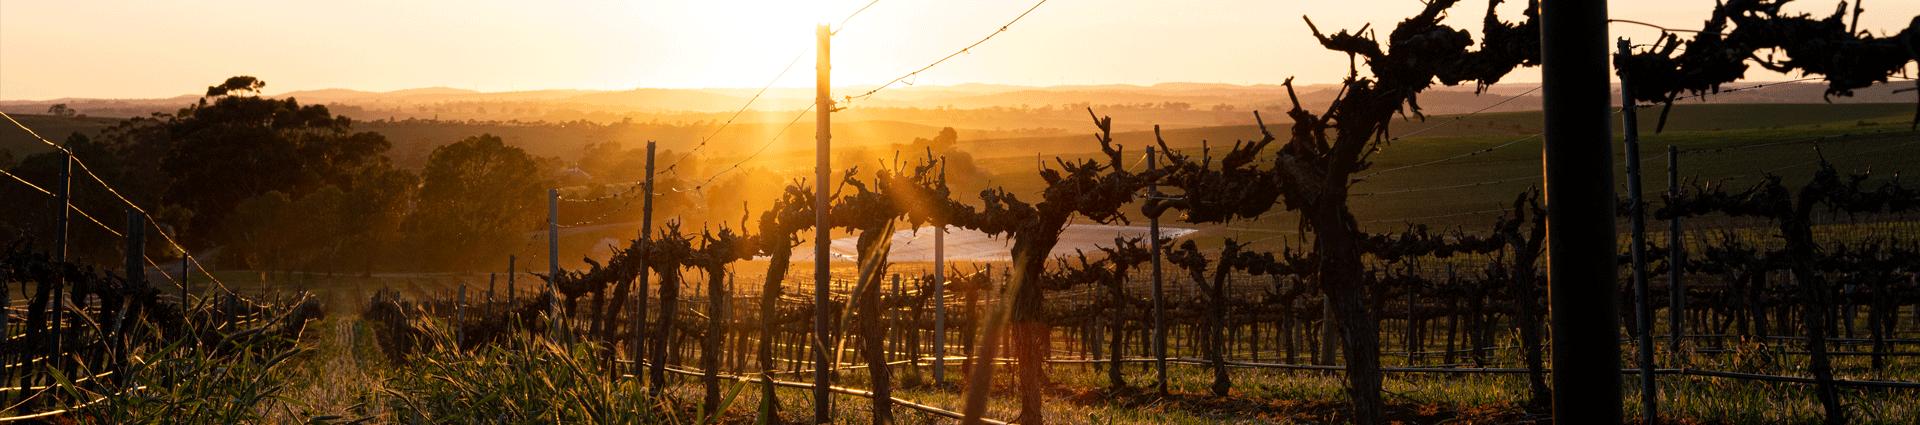 Botanic vineyard at sunrise in winter